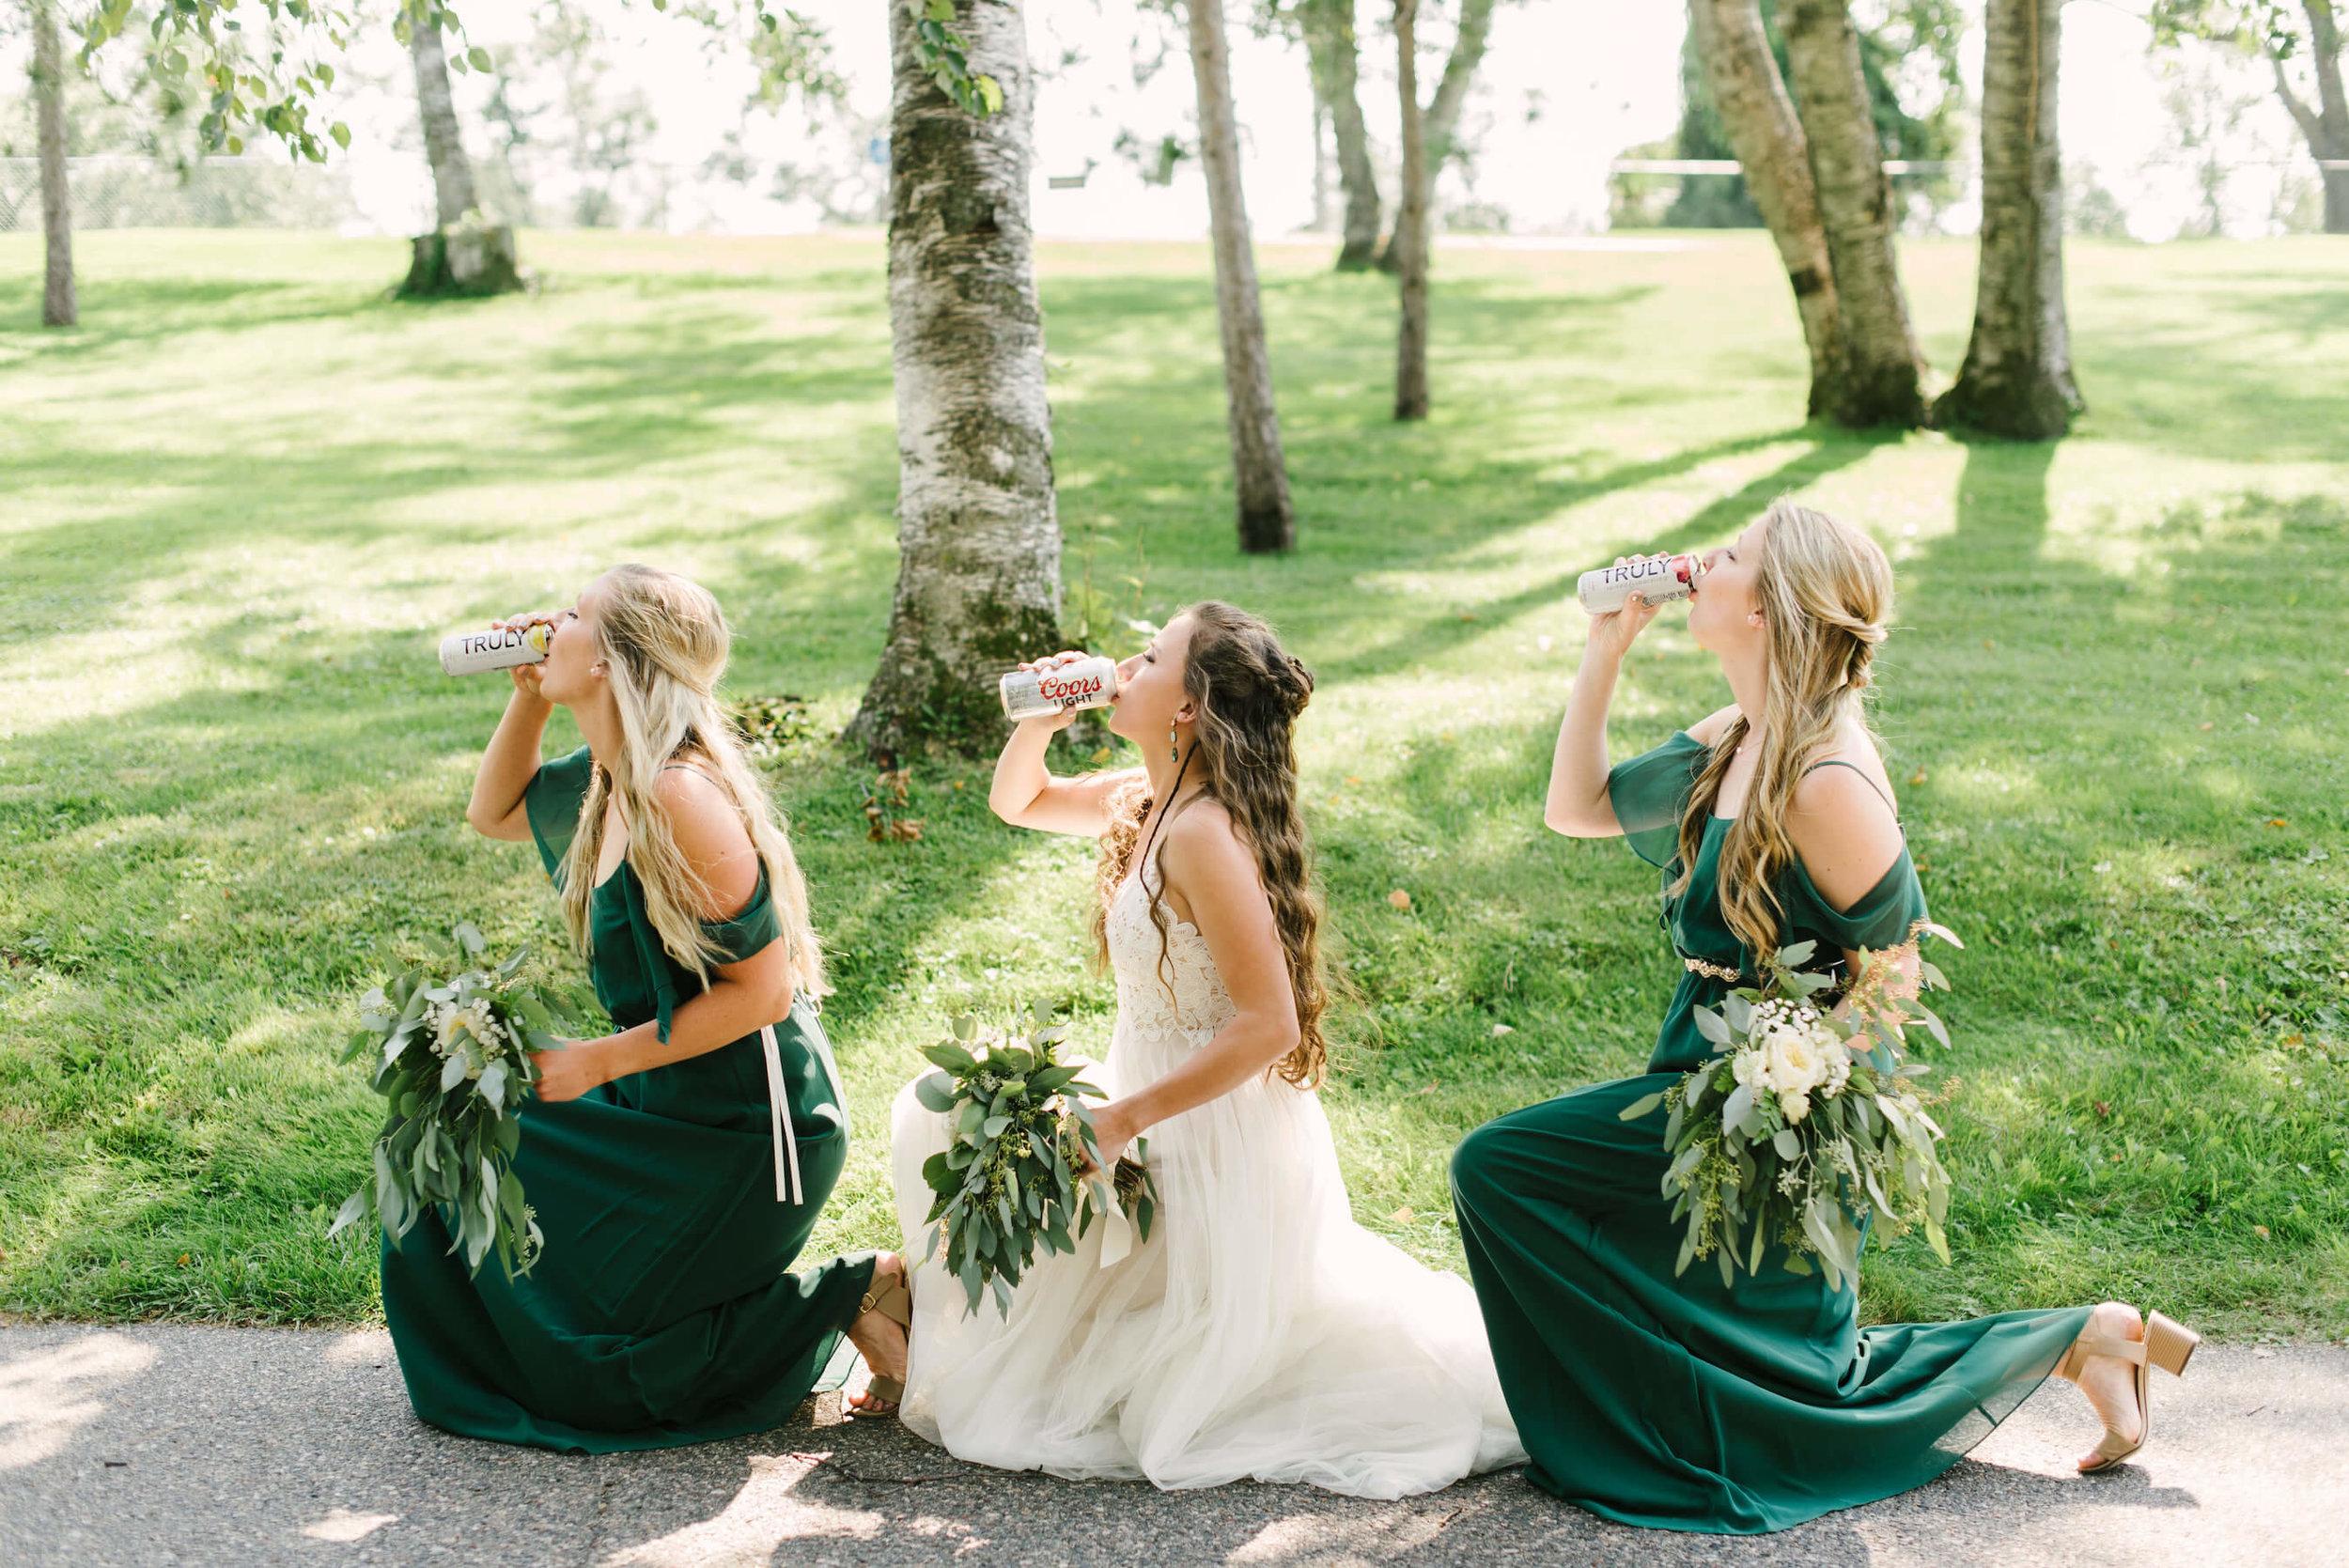 engle-olson-wedding-blair-taylor-21.jpg